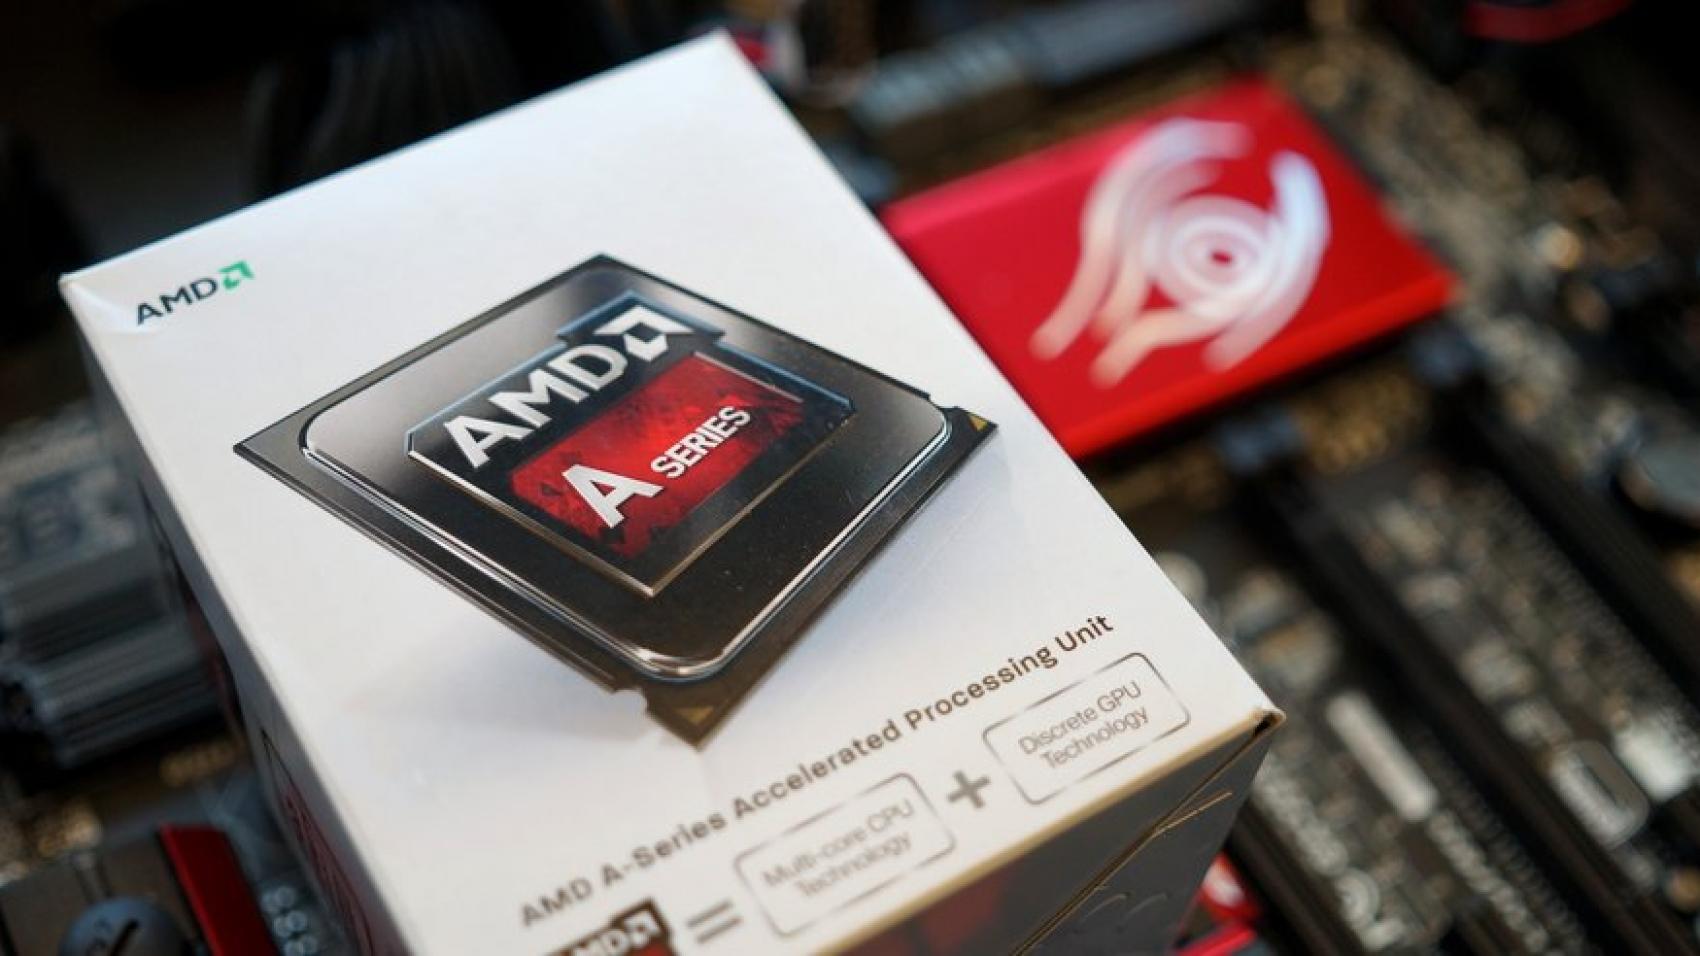 APU AMD A-Series Pro